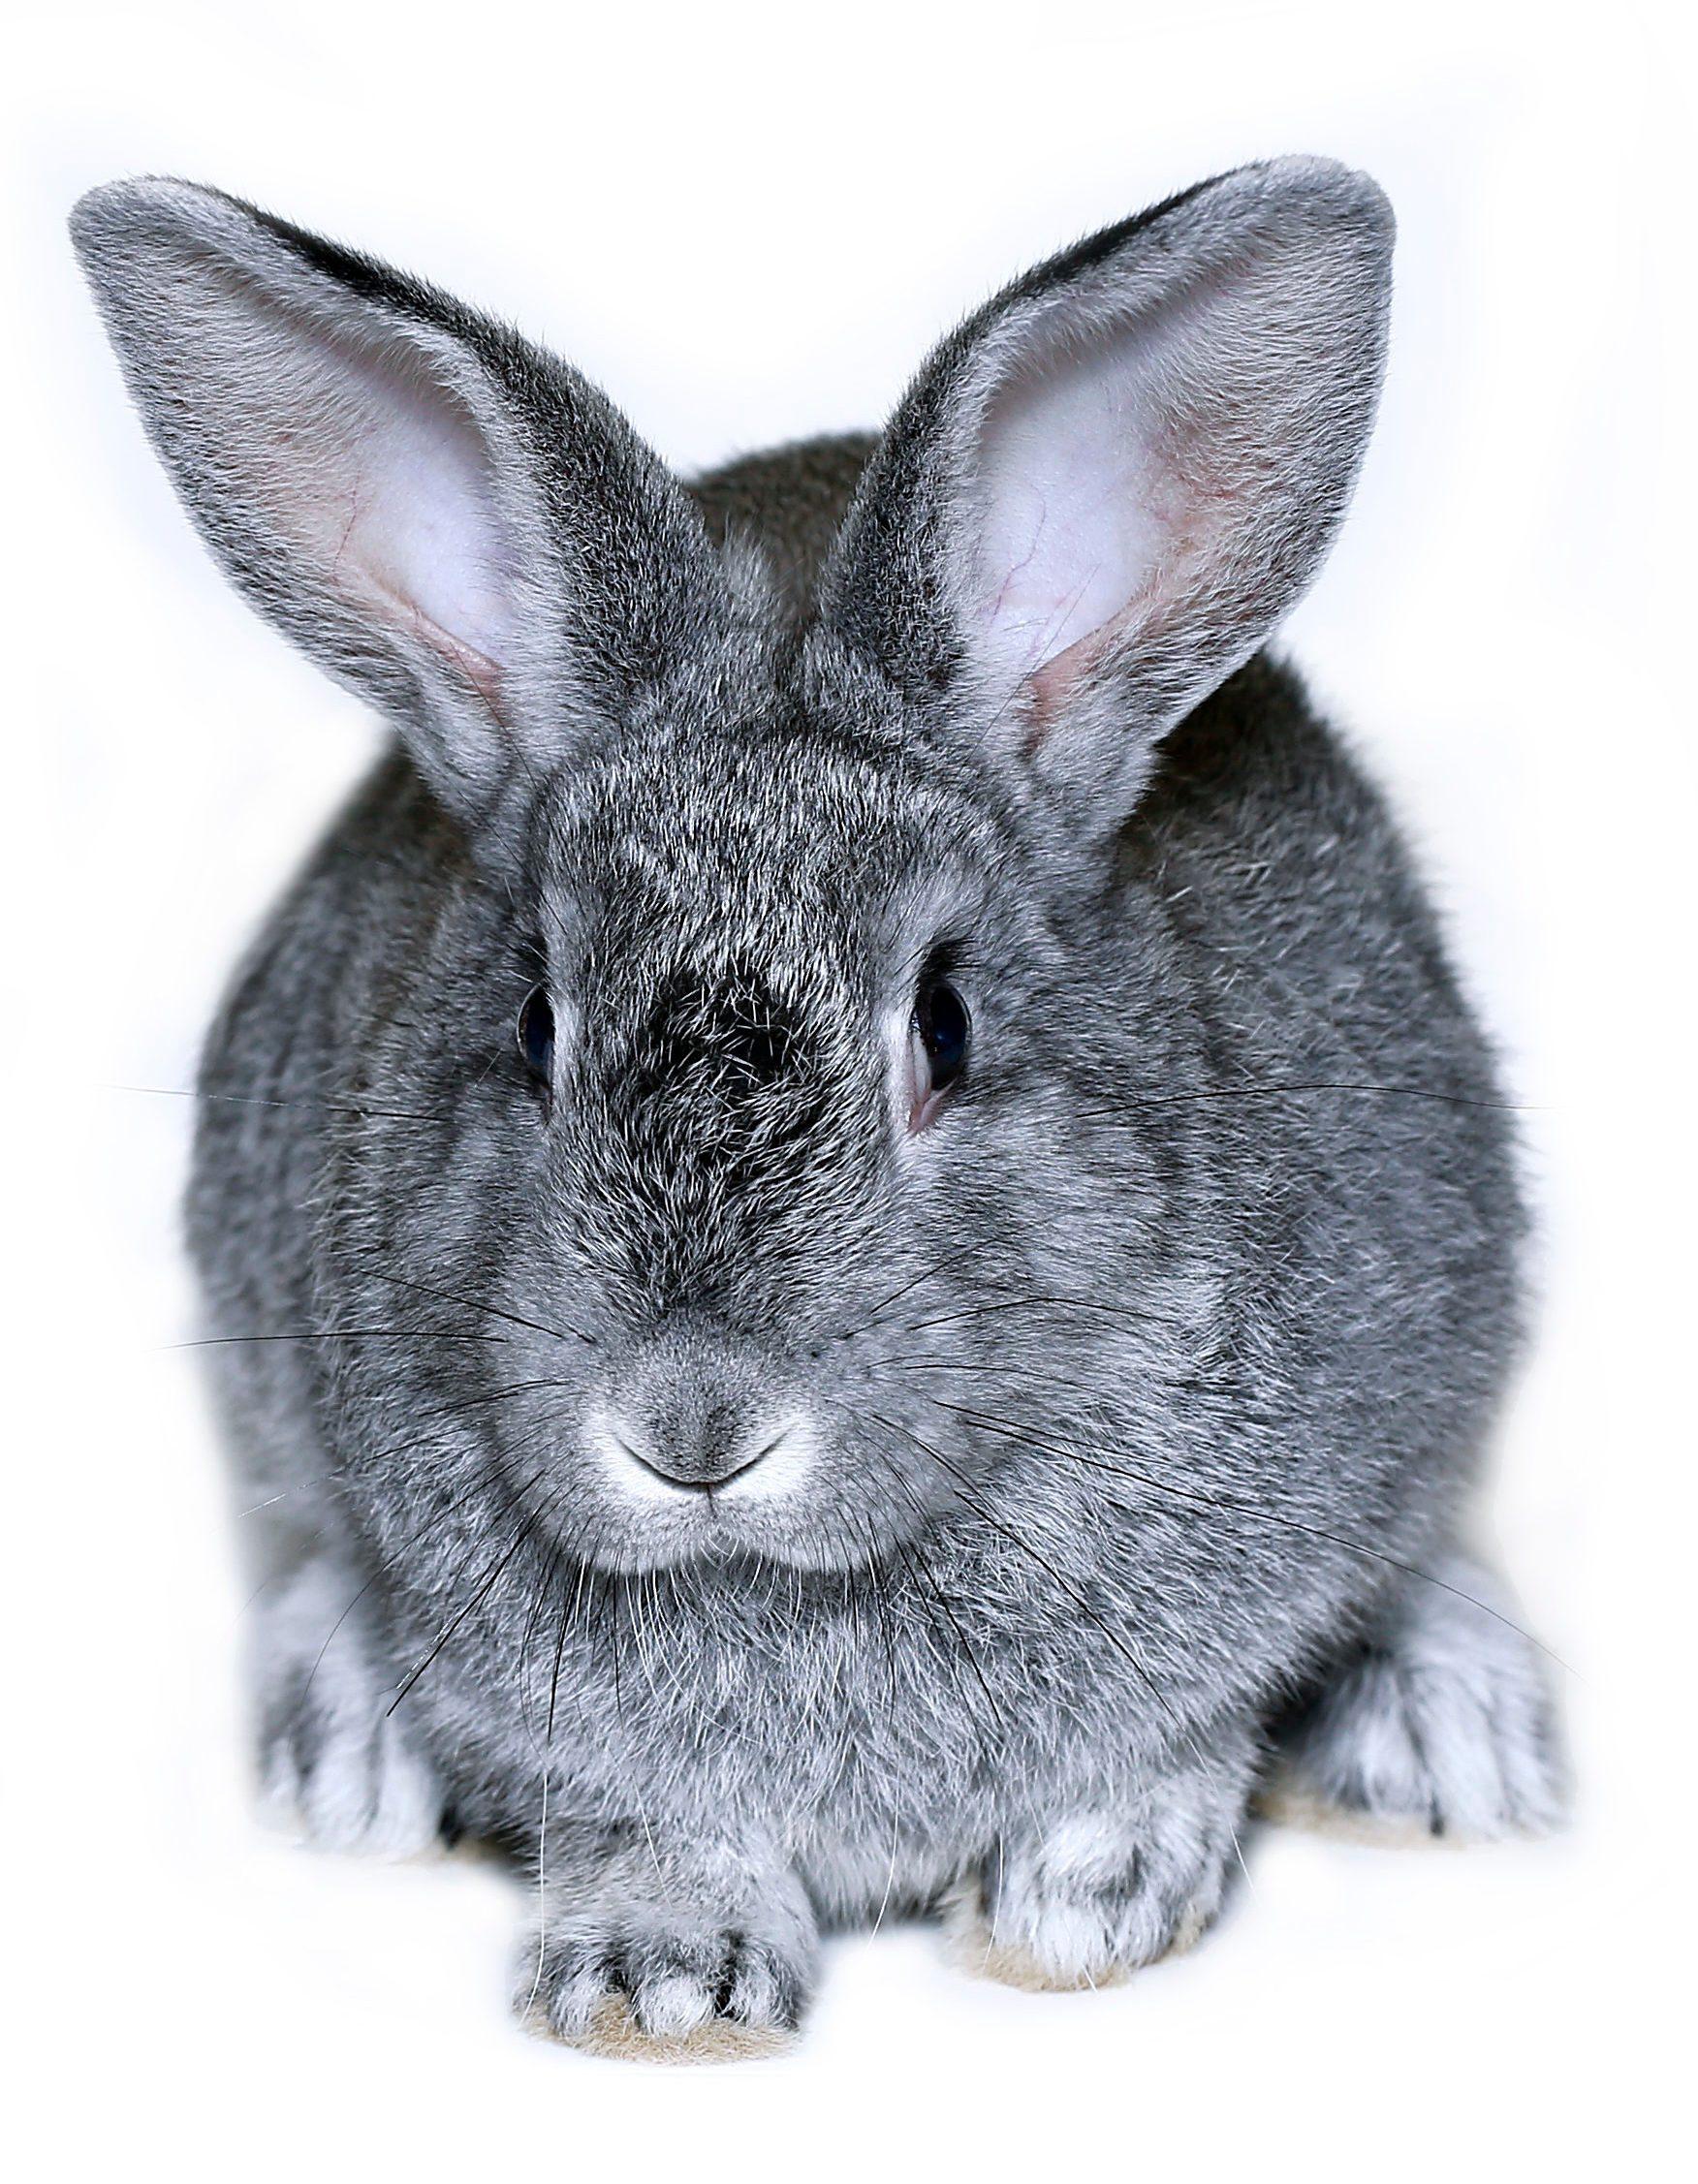 Little rabbit breed of gray silver chinchilla